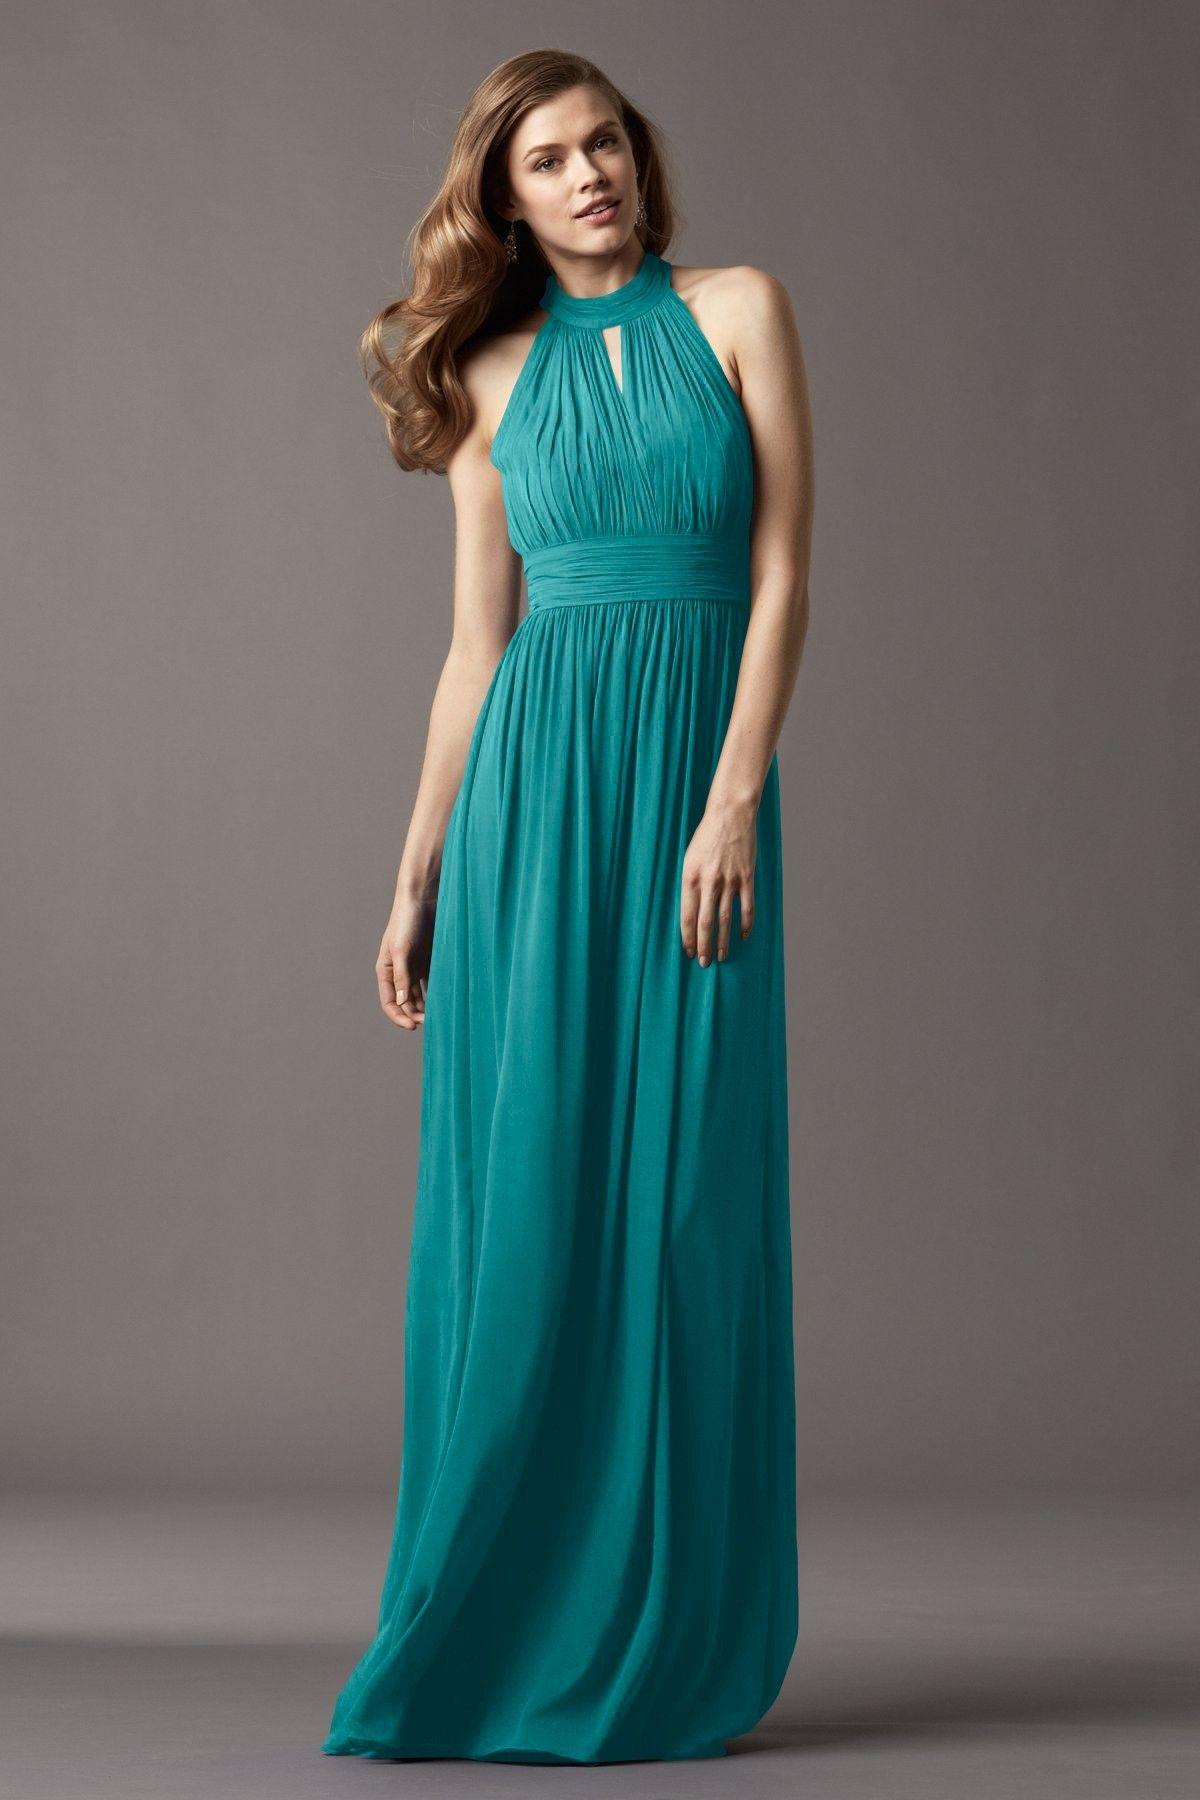 Watters Bridesmaid Dresses - Style Empress 4521 [Empress] - $260.00 ...